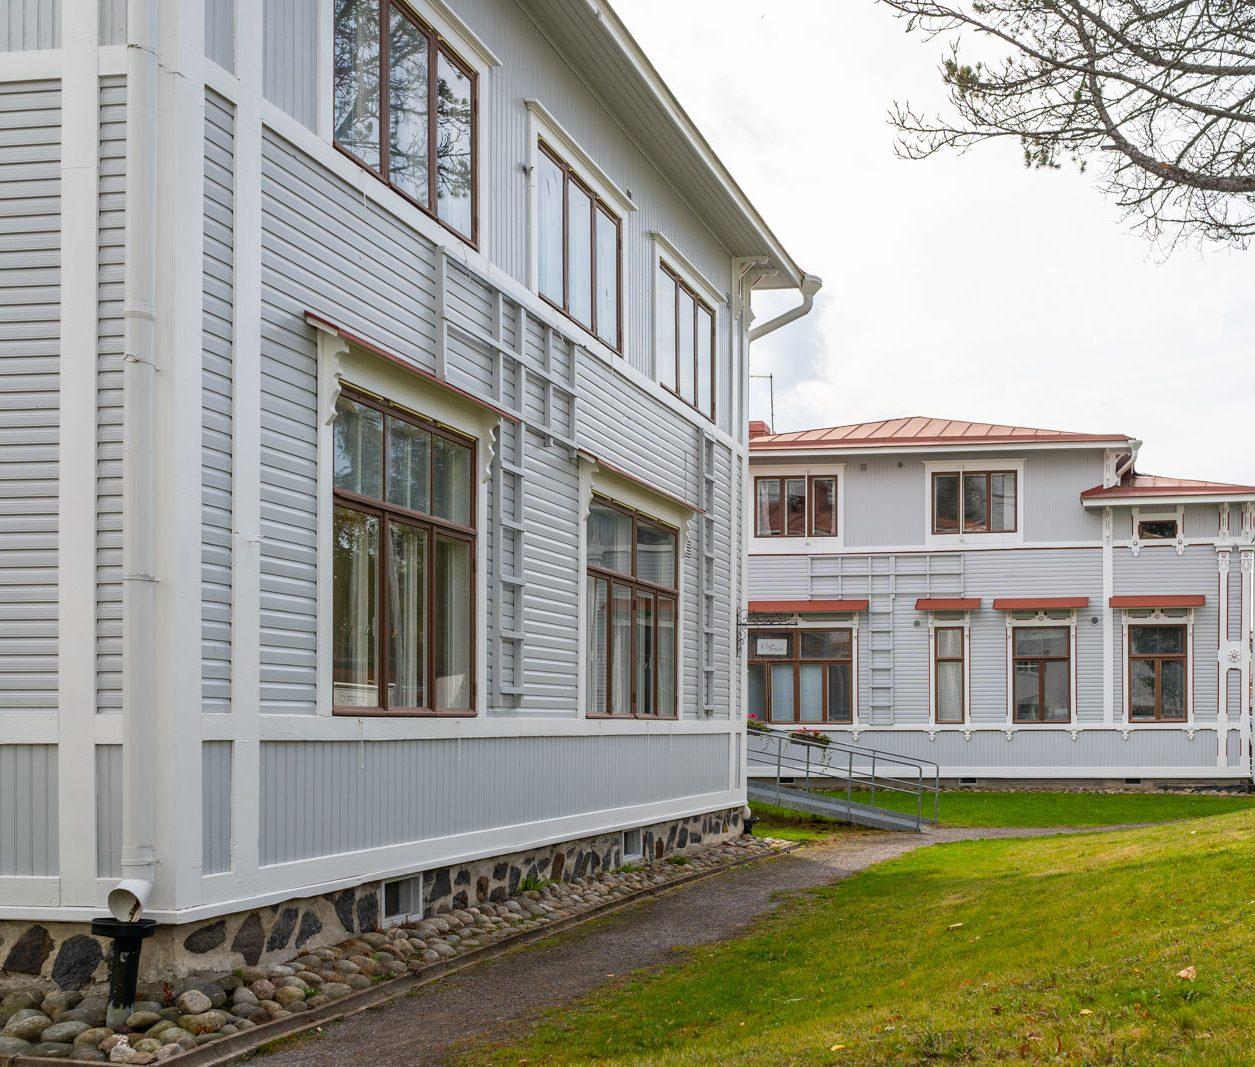 savonlinnan-innovaatiokeskus-2